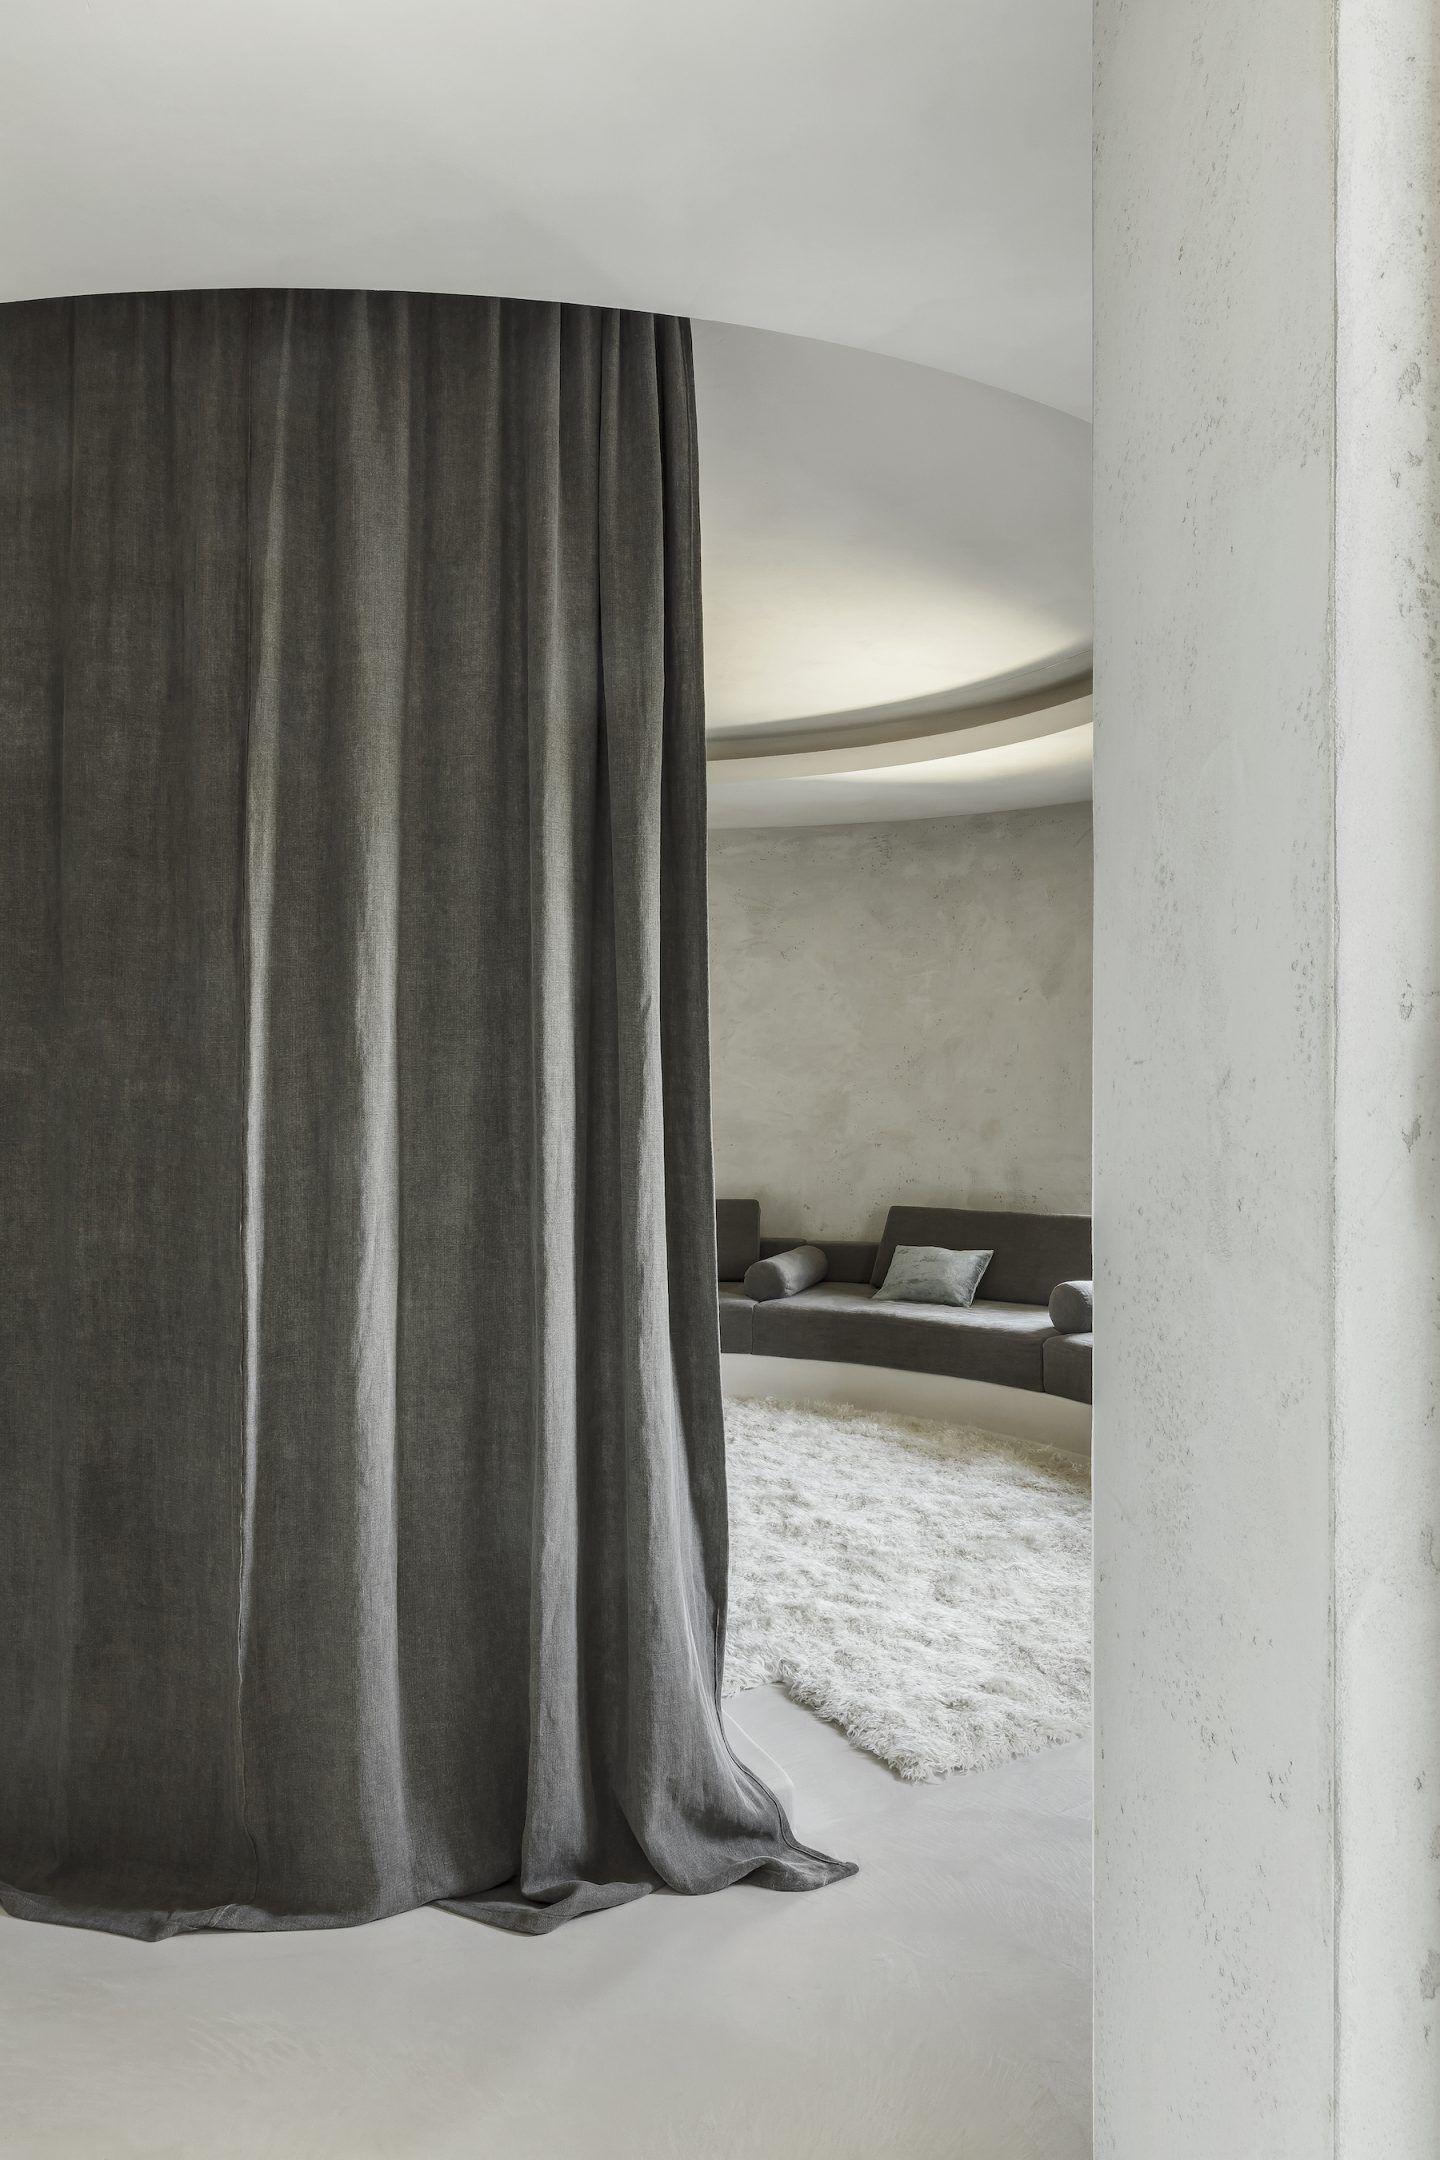 IGNANT-Architecture-Arjaan-De-Feyter-Silo-Apartment-13